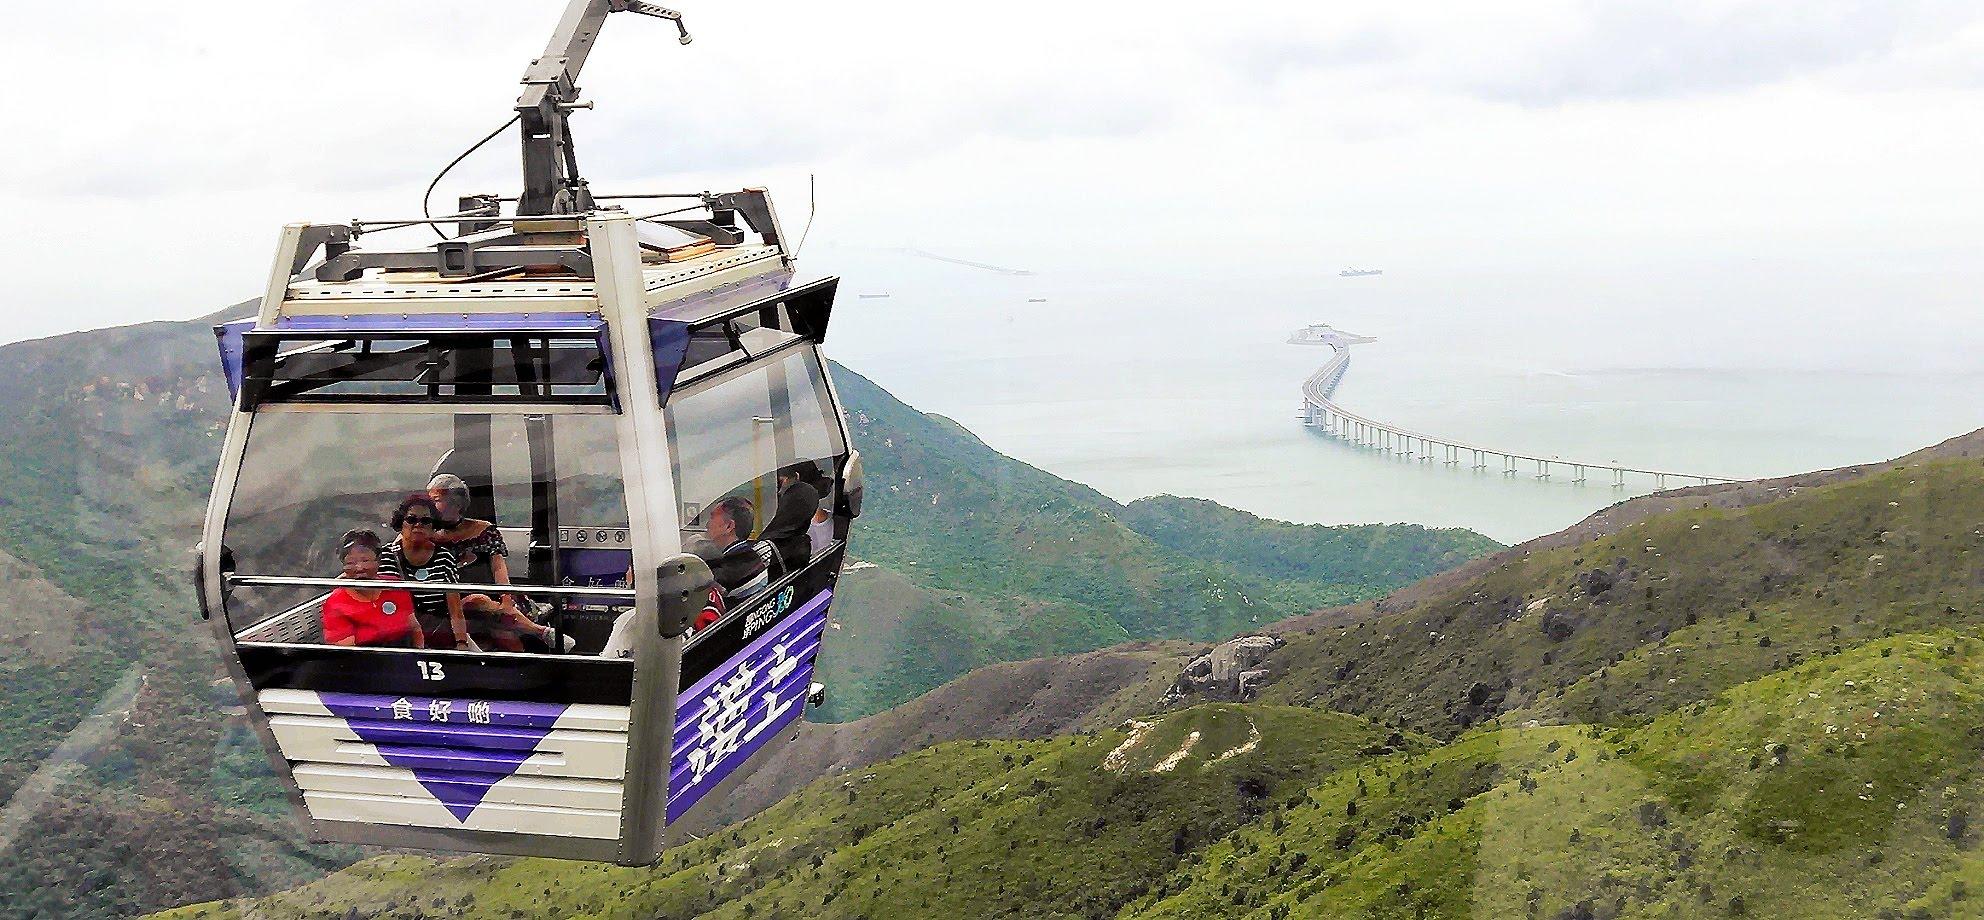 You can see the Hong Kong Zhuhai Macau Bridge during the Ngong Ping 360 Cable Car ride.